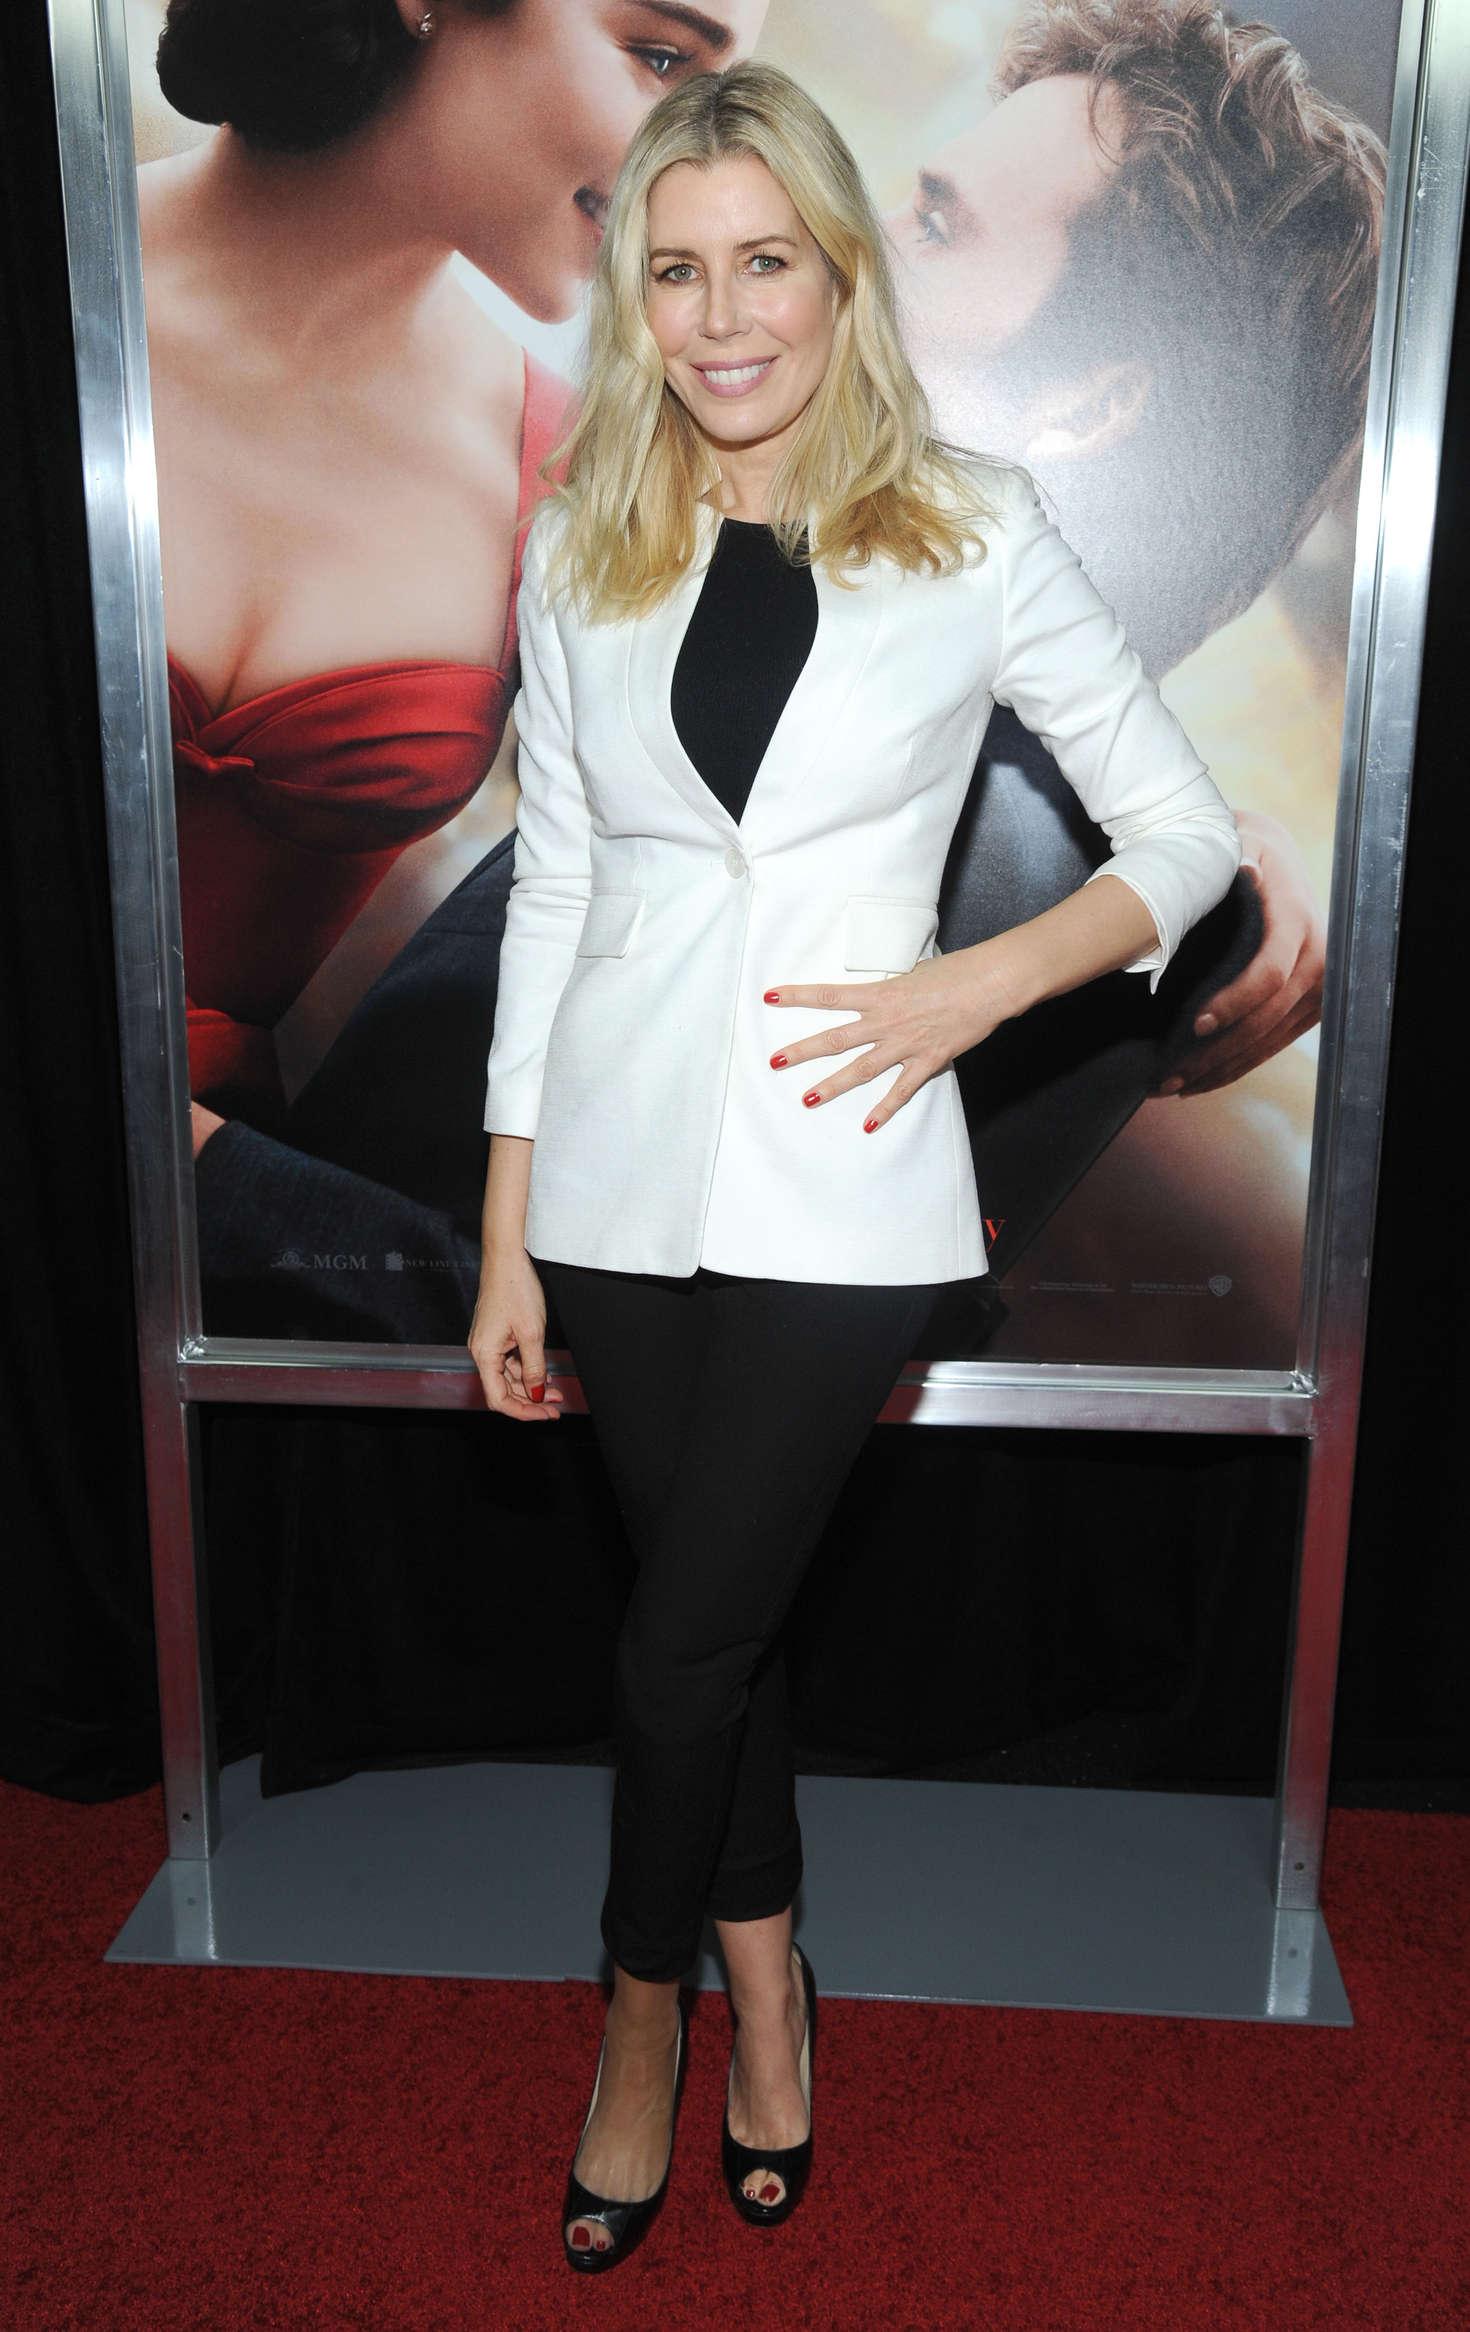 Aviva Drescher - 'Me Before You' Premiere in New York